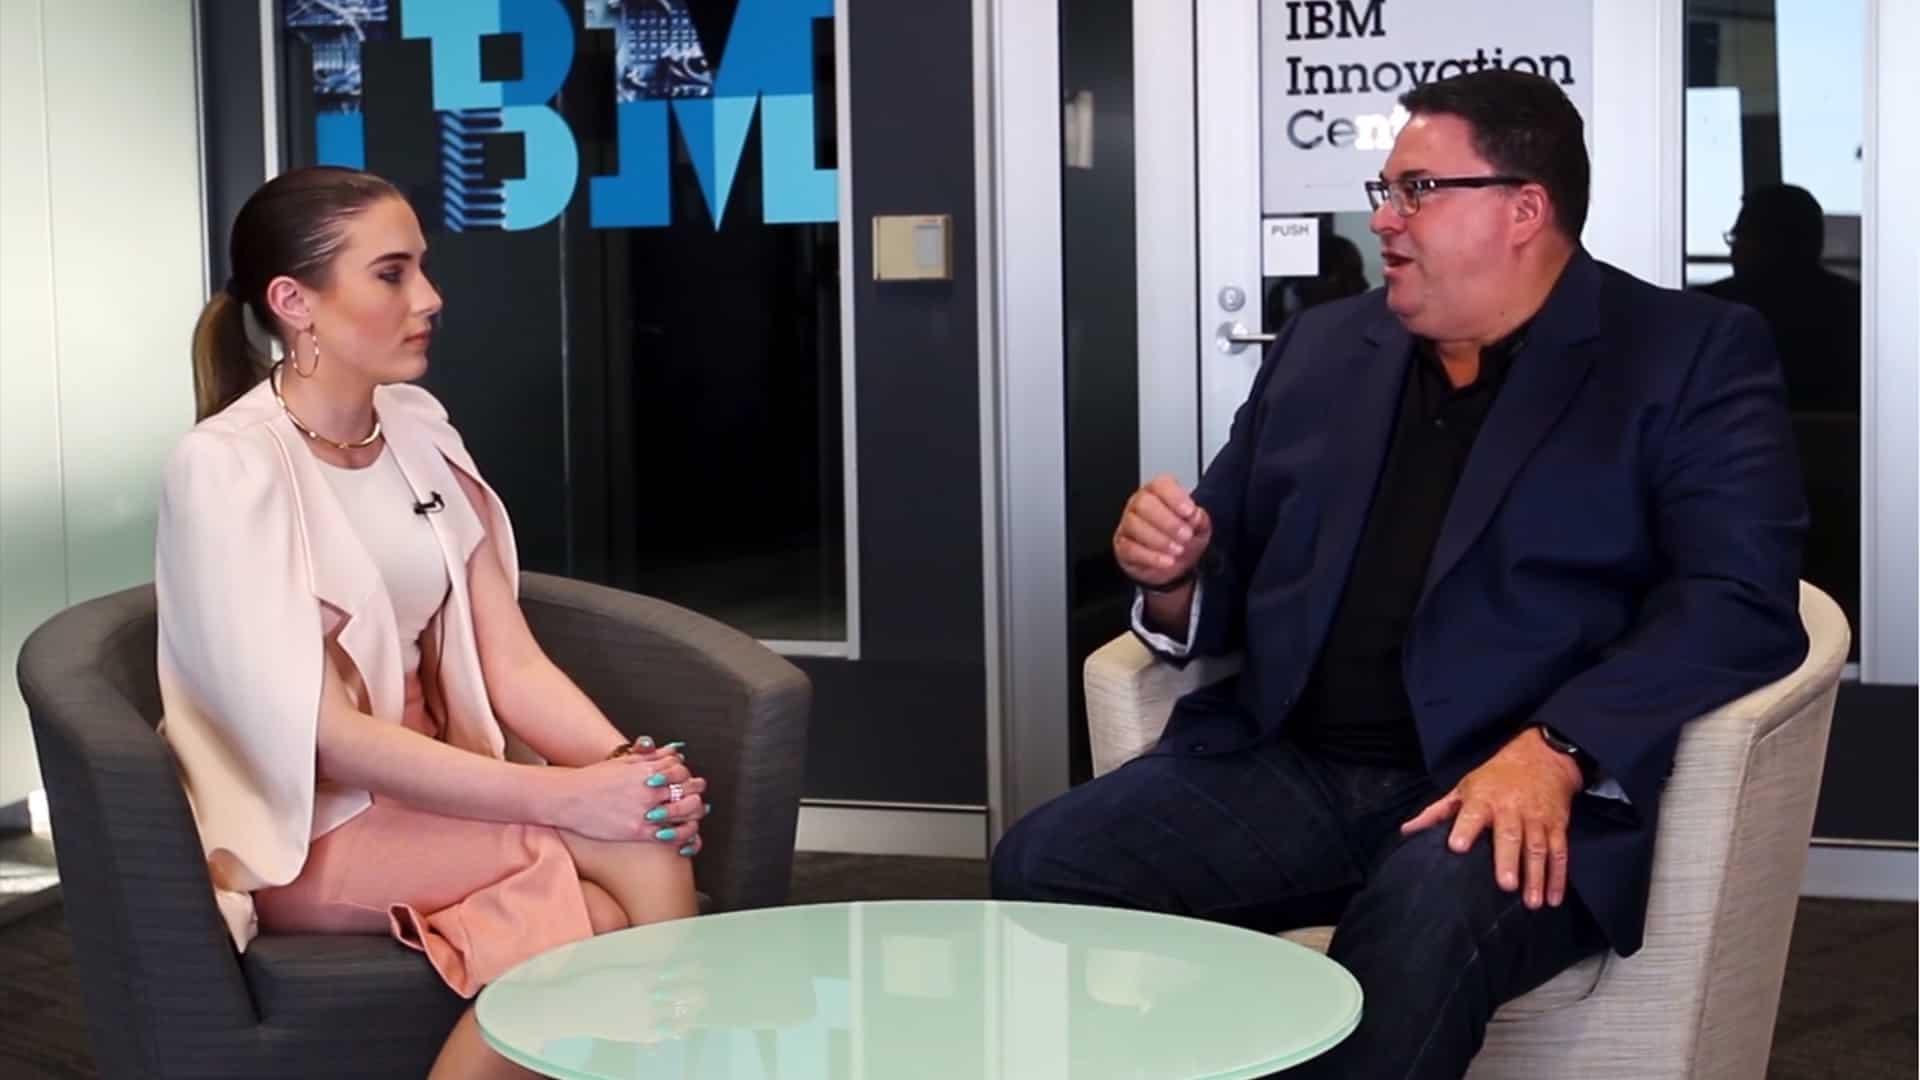 ibm-interview-kbtv